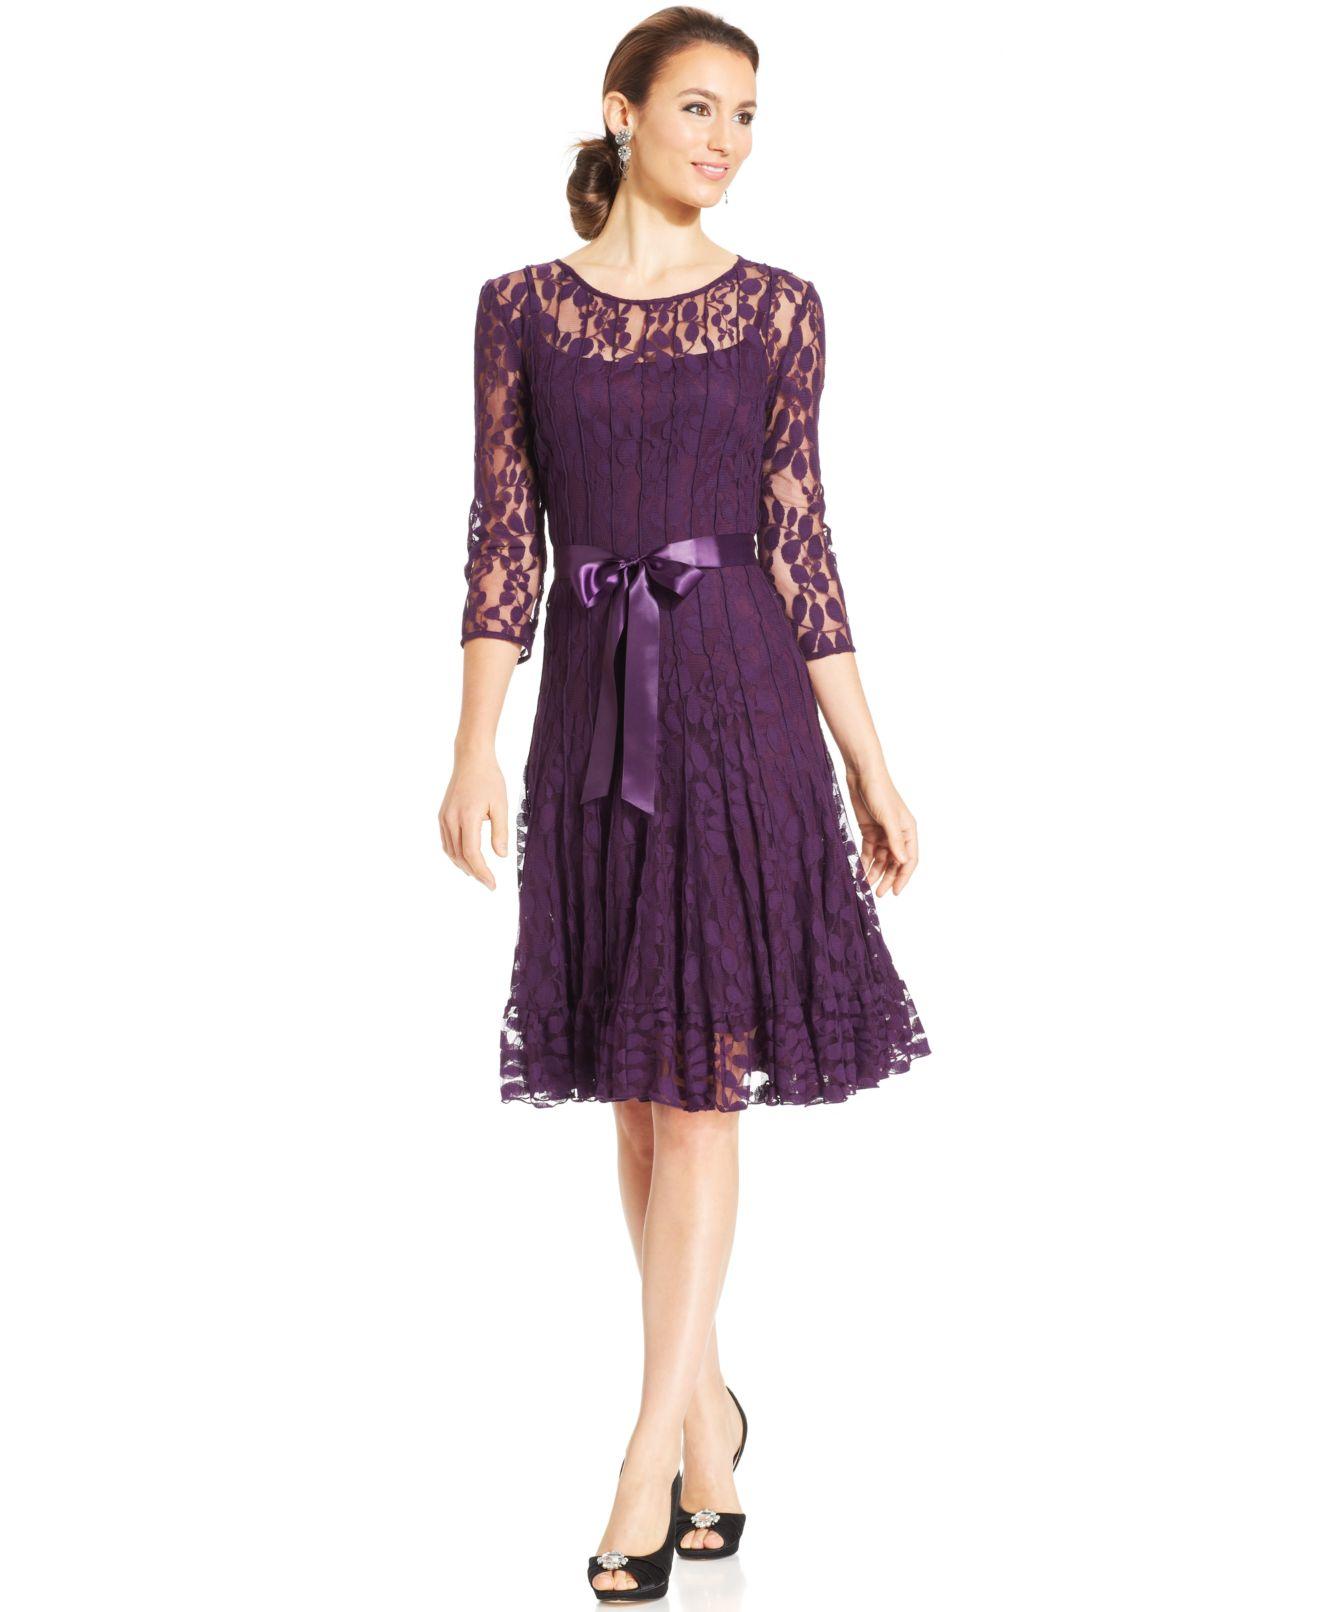 macys dresses with sleeves photo - 1